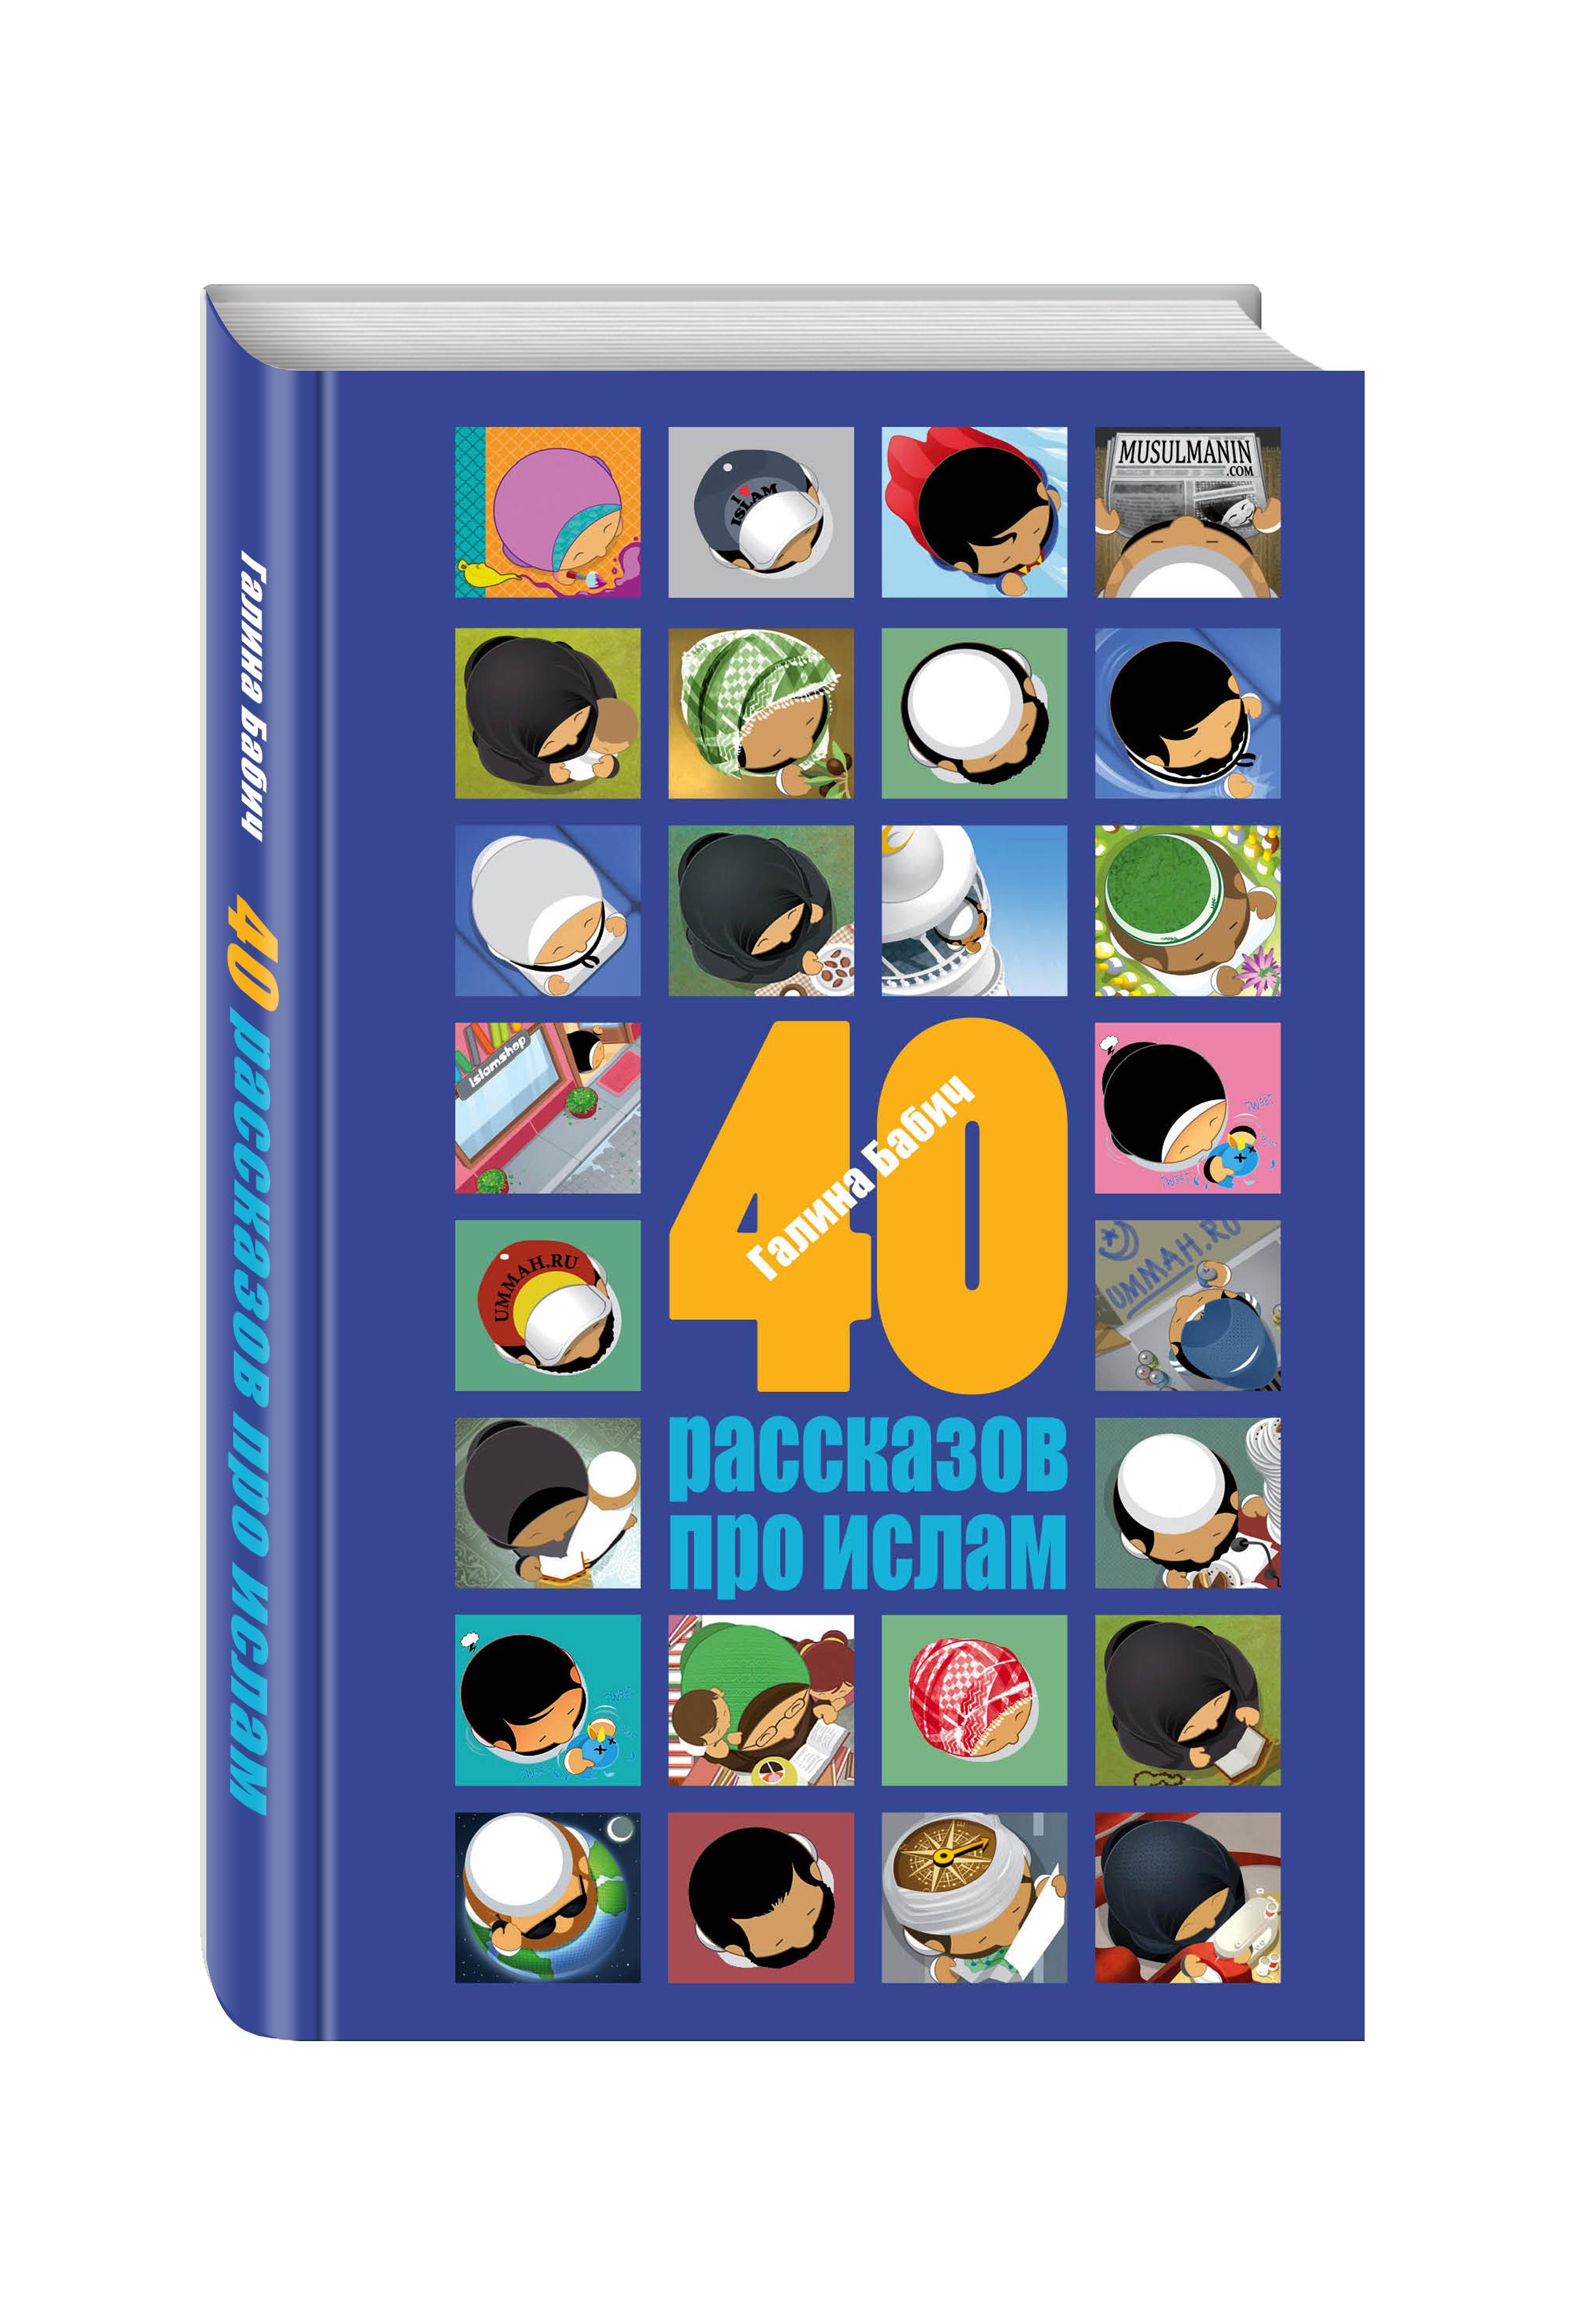 40 рассказов про ислам ( Бабич Г.  )